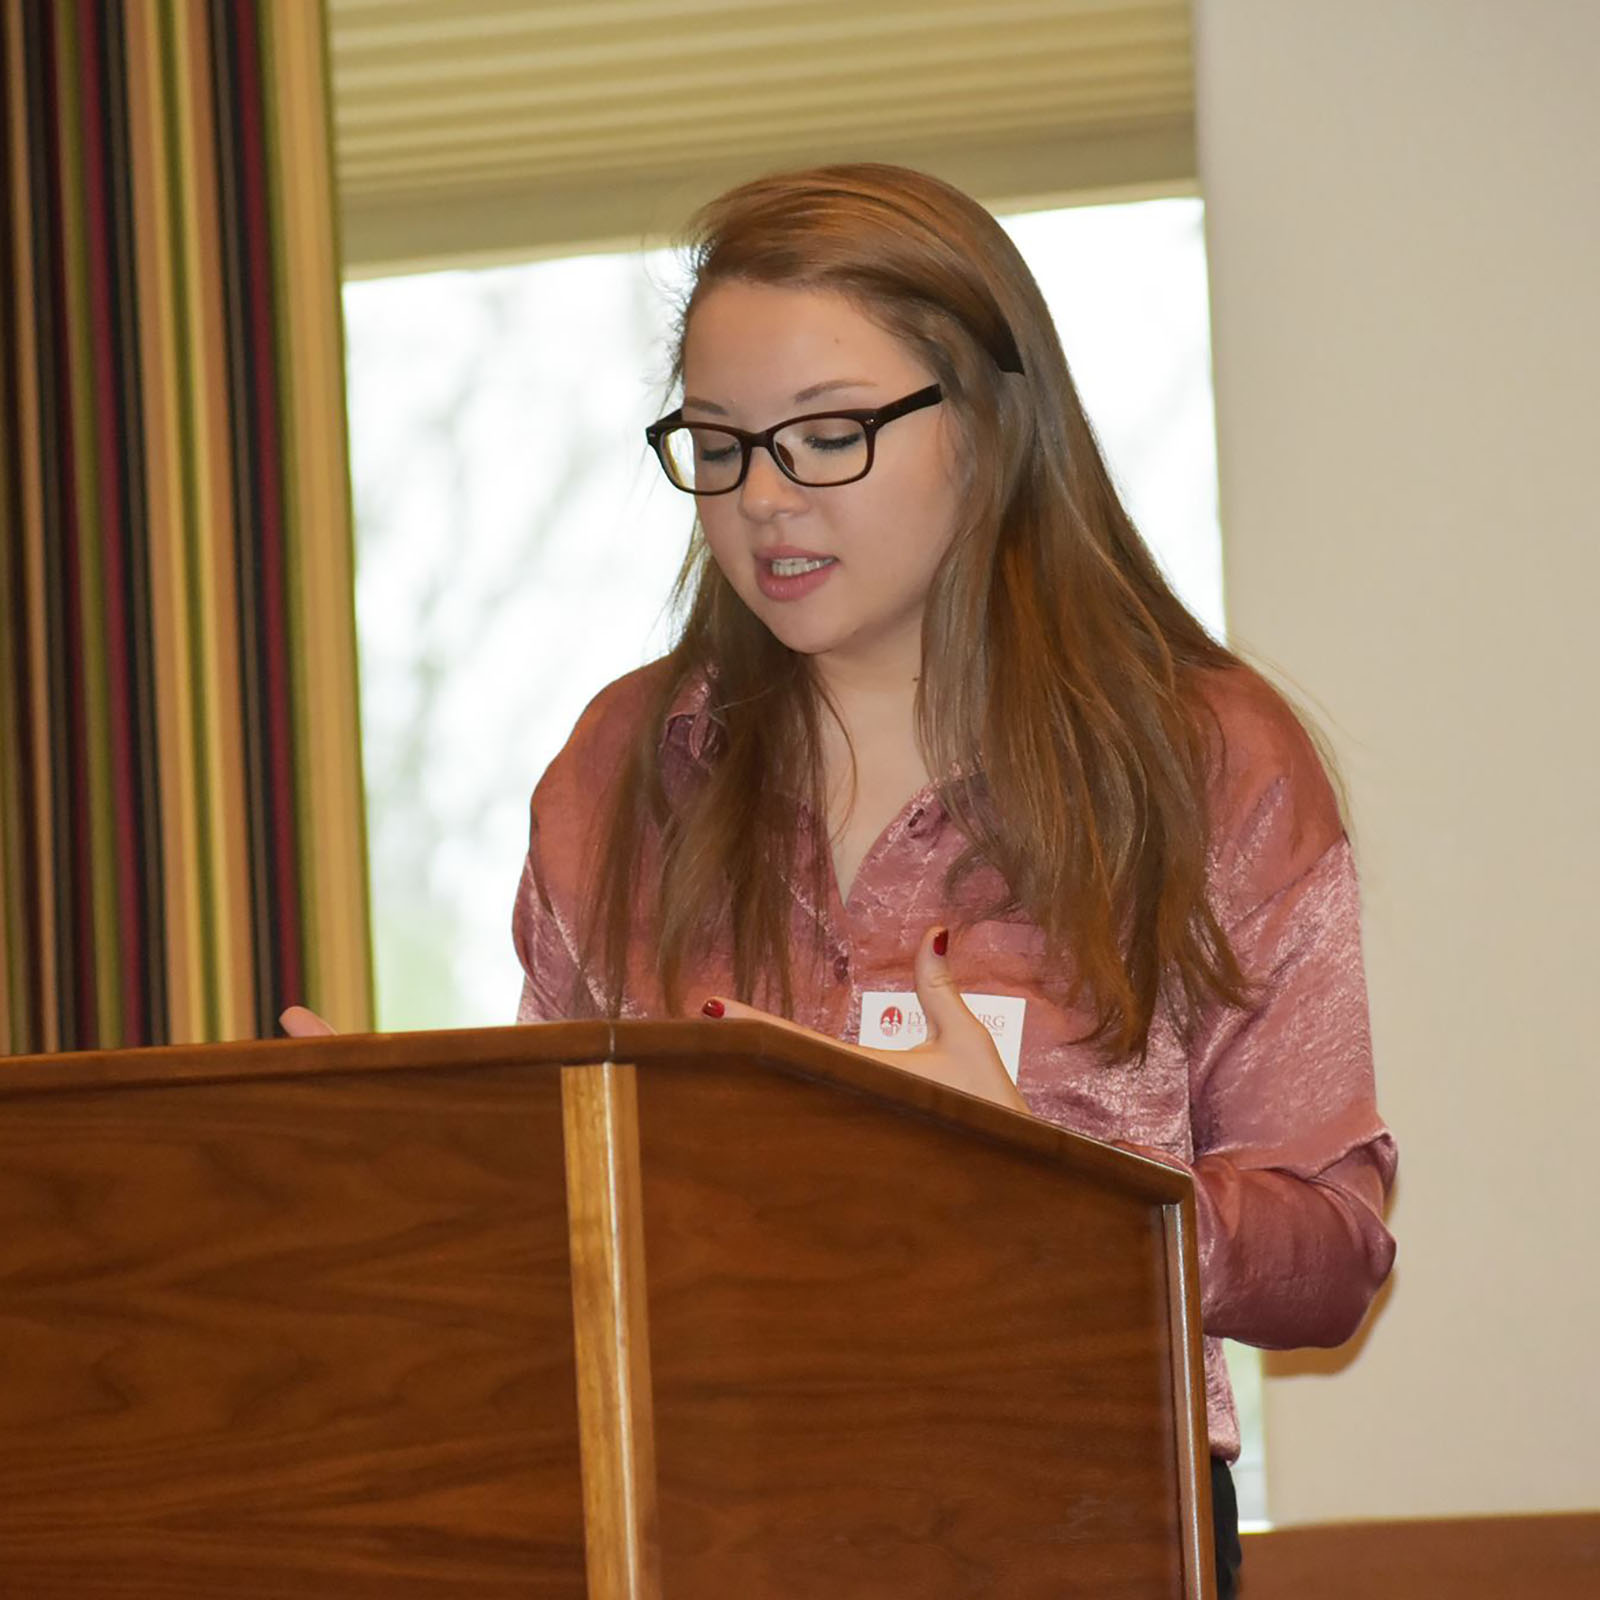 Alexandra Wieczorek presents her original research at a conference.